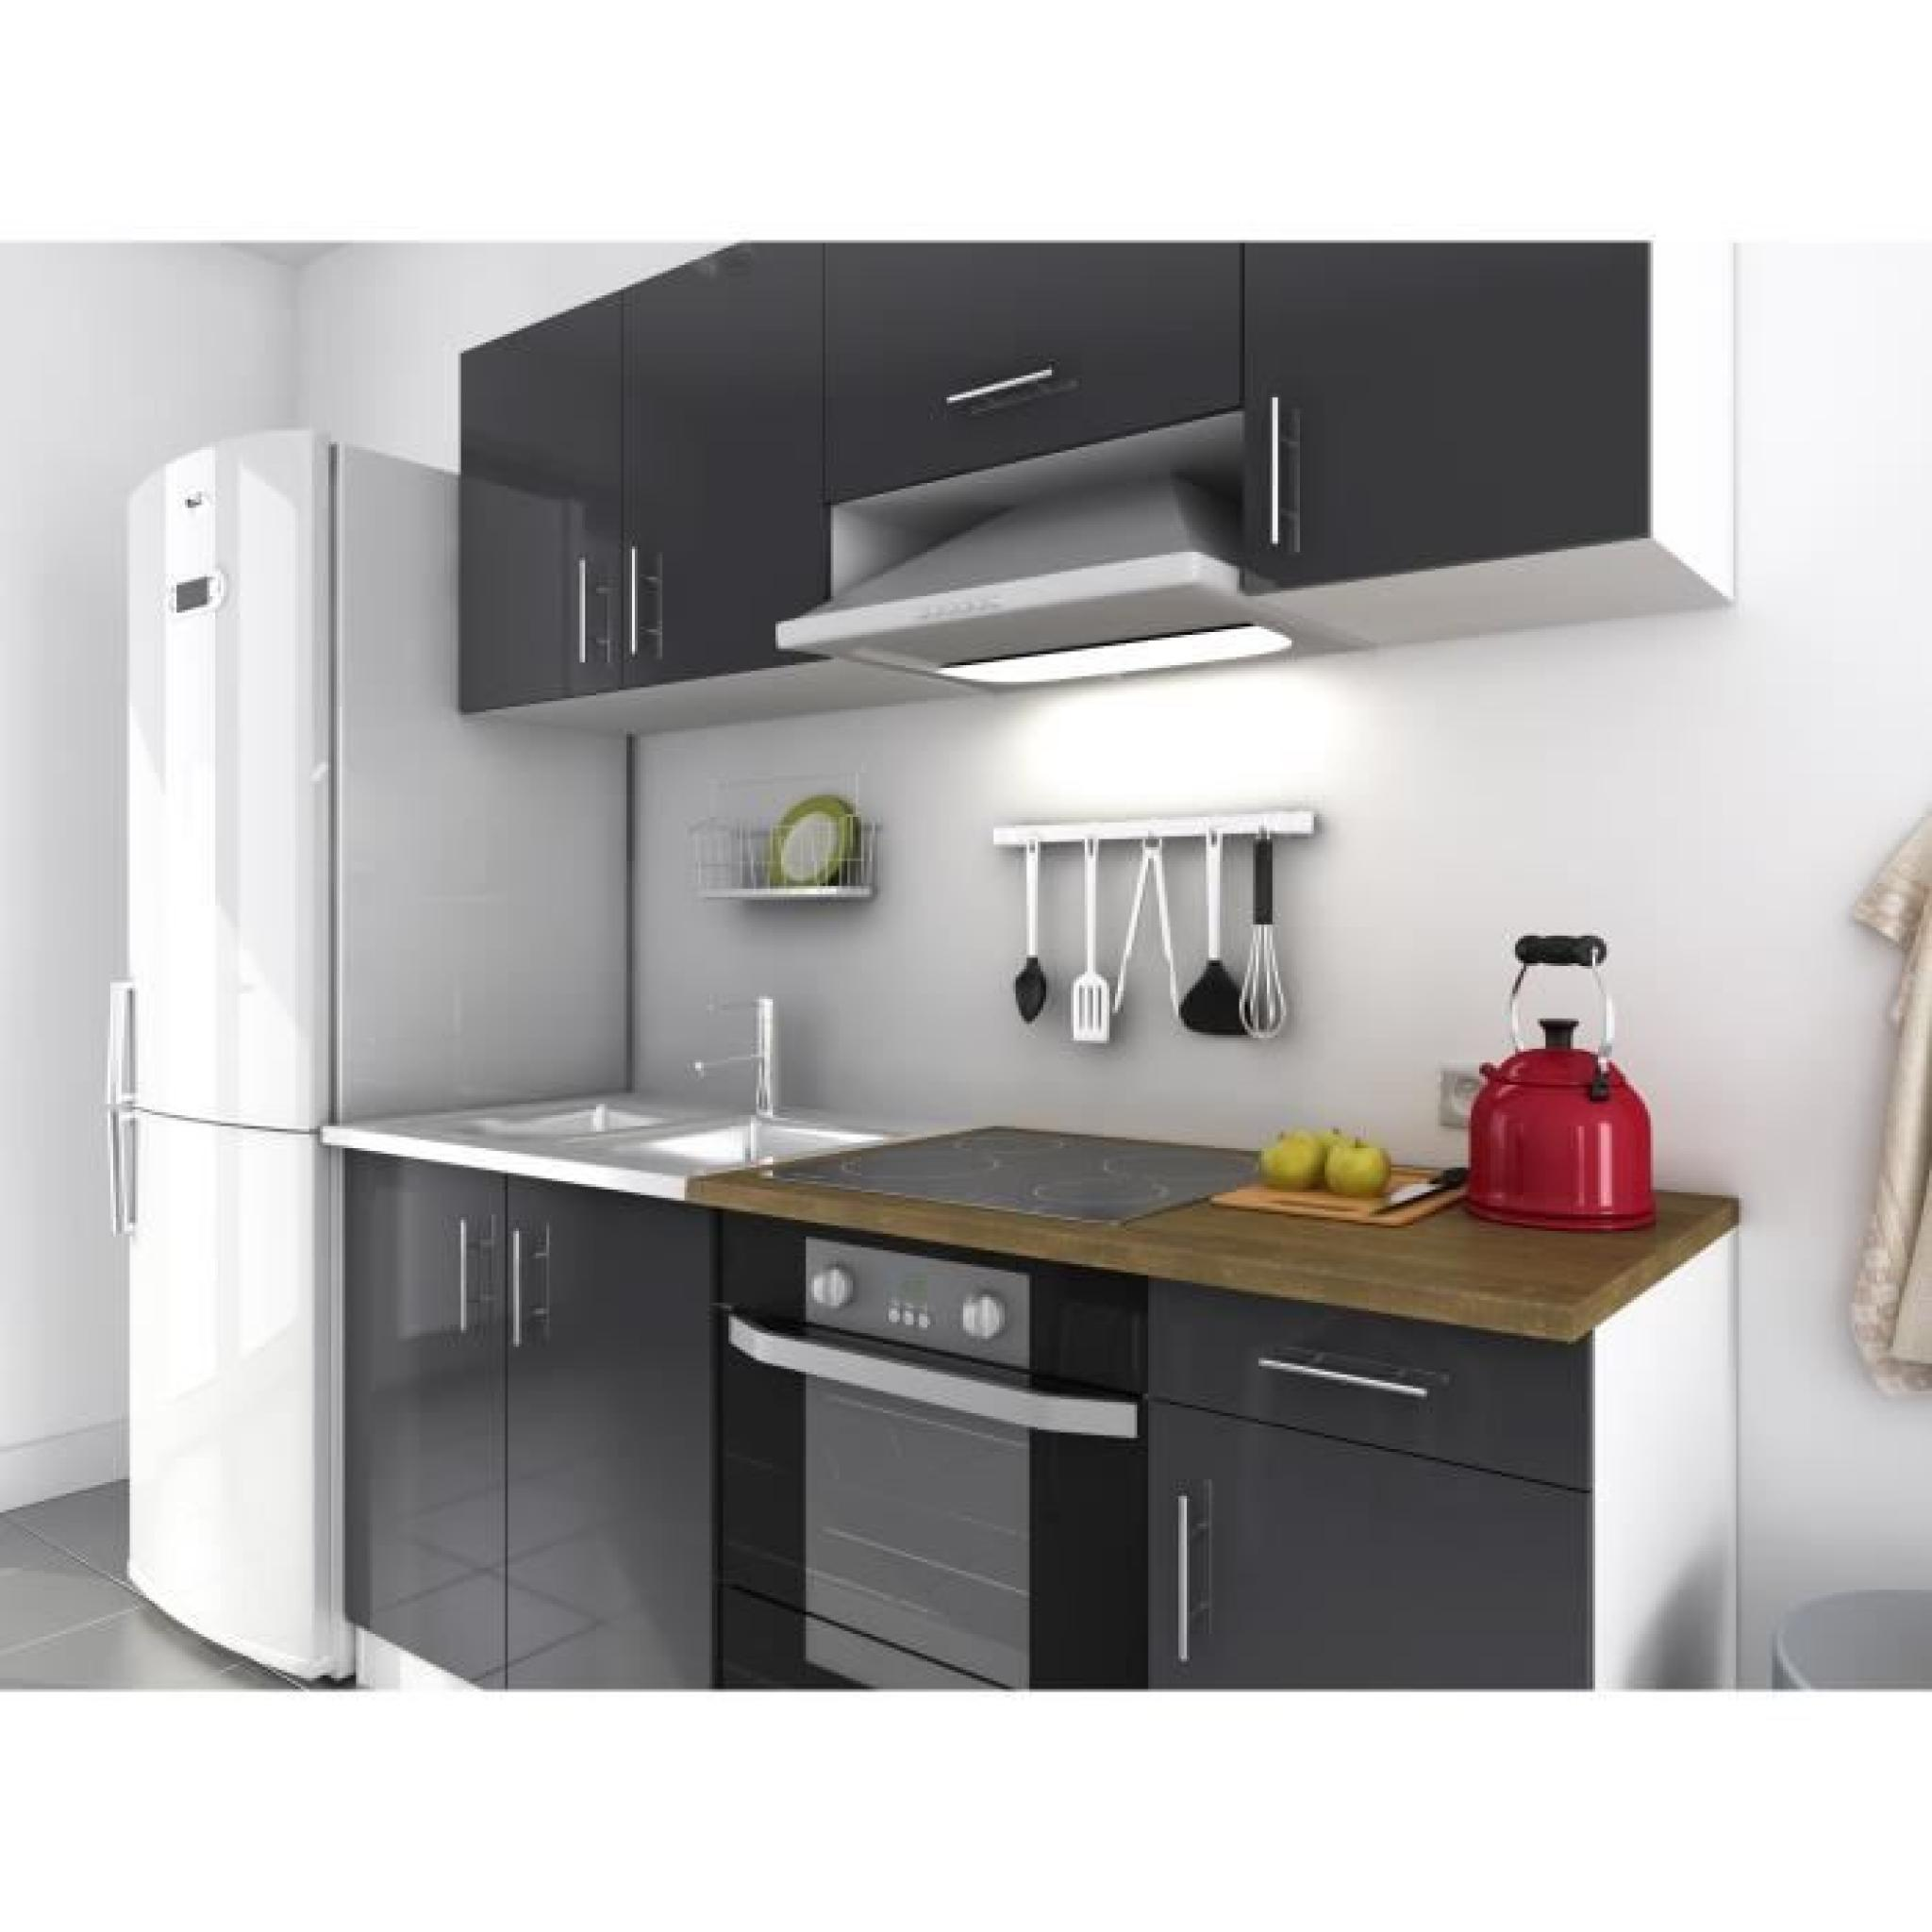 cuisine equipee complete castorama cuisine complete avec. Black Bedroom Furniture Sets. Home Design Ideas